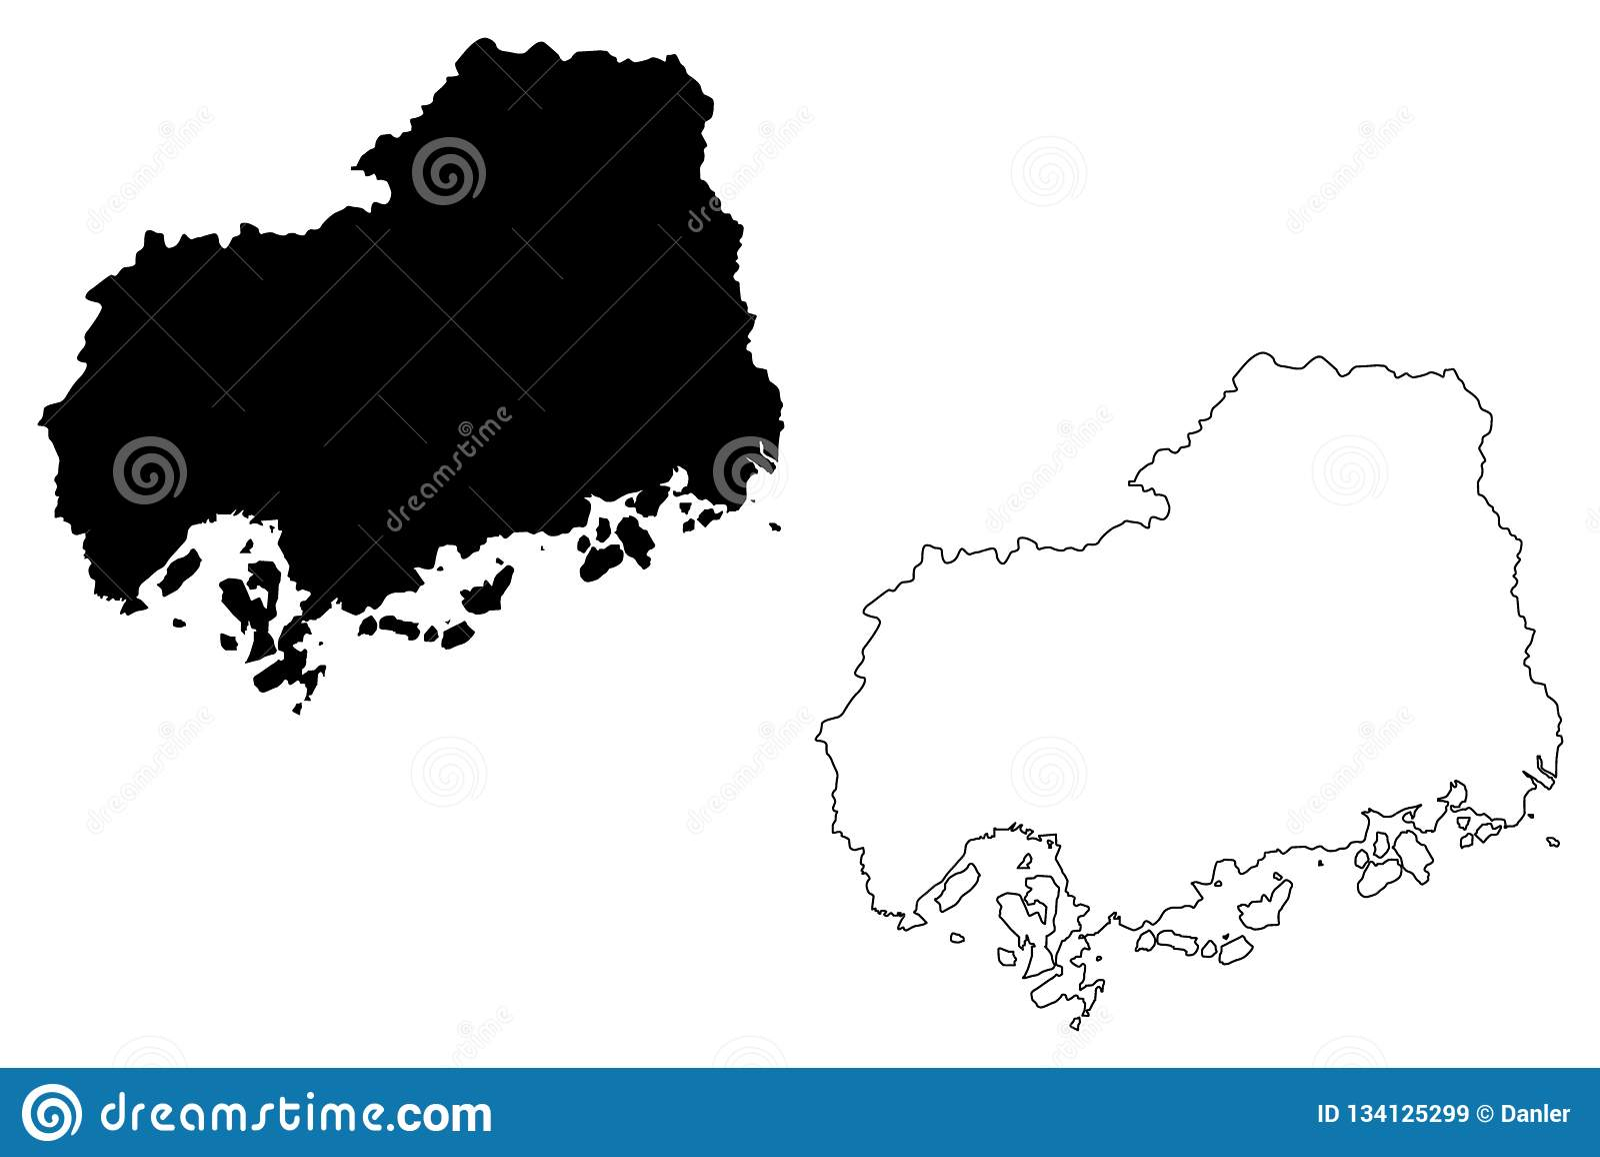 Hiroshima Prefecture Map Vector Stock Vector - Illustration of ...